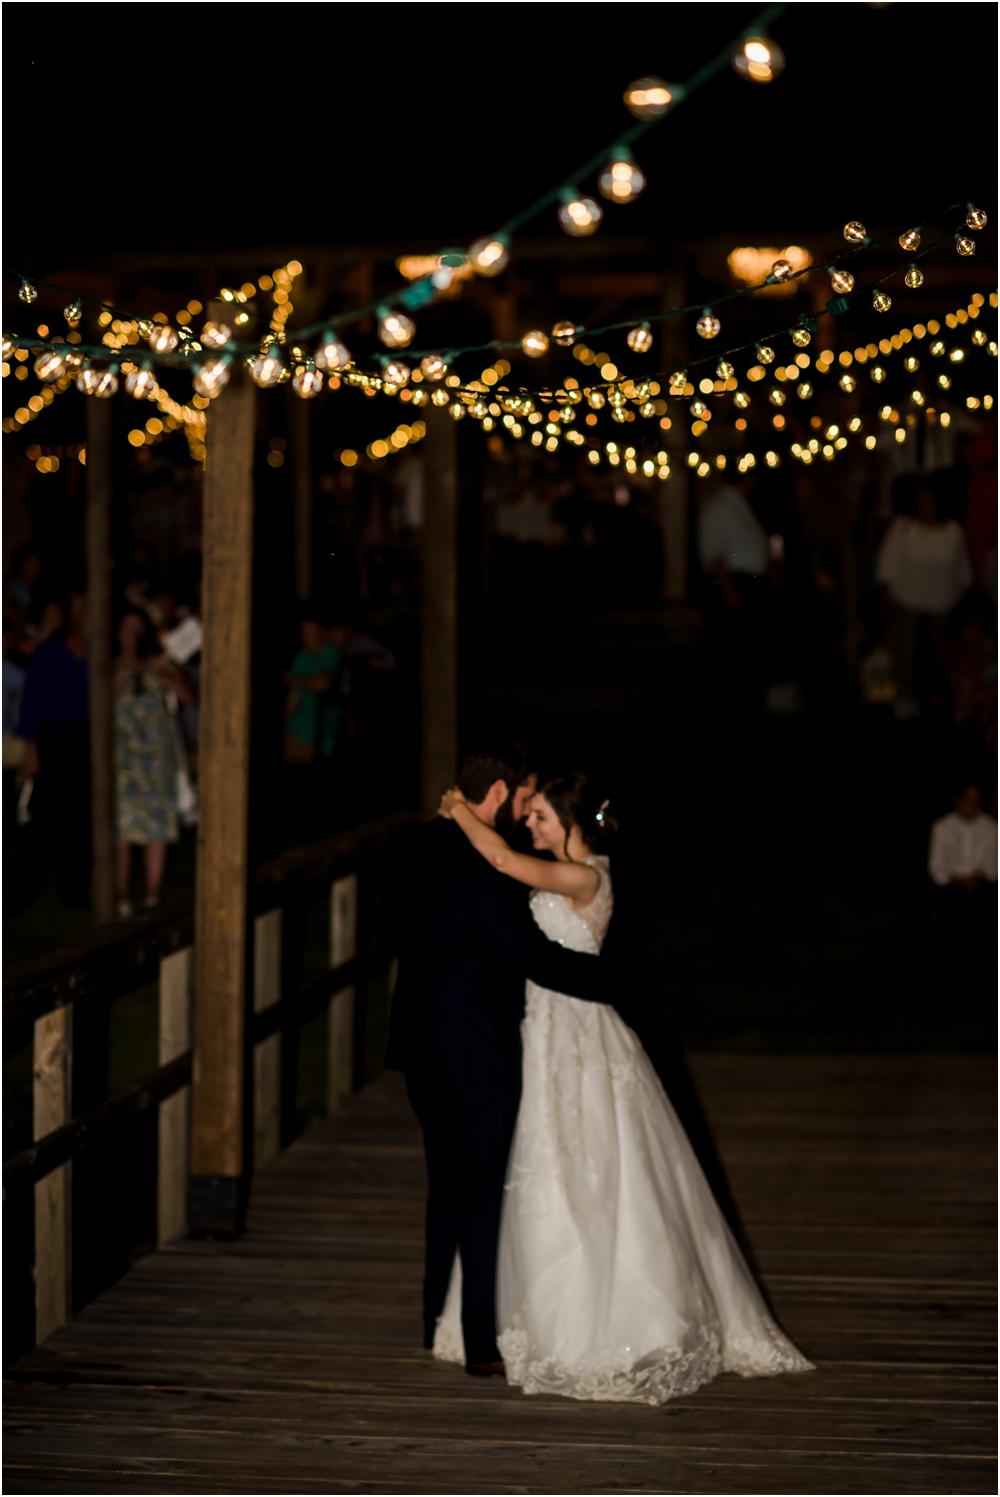 marianna-florida-wedding-photographer-kiersten-grant-178.jpg